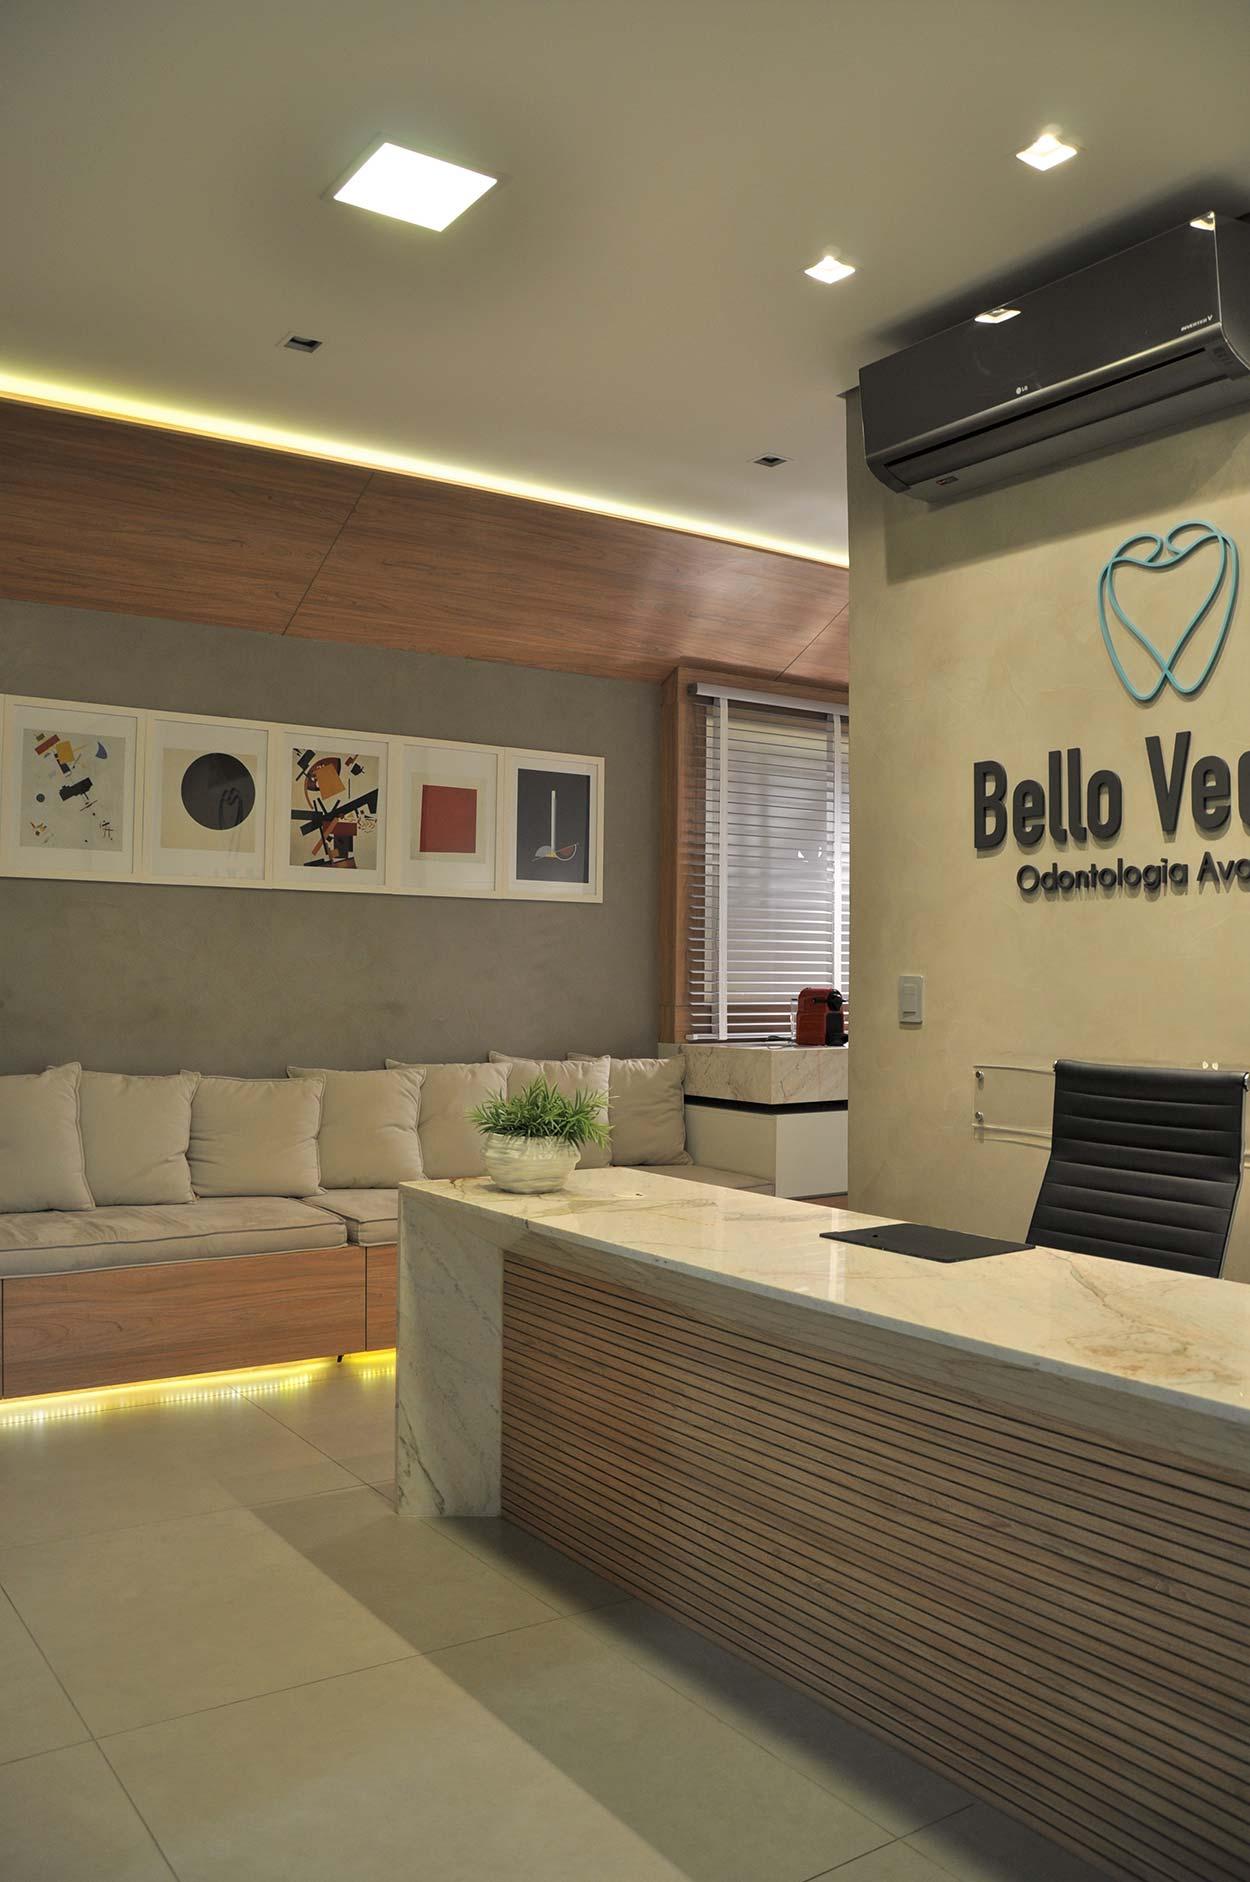 veridianaperes-comerciaisecorporativos-bellovedere2